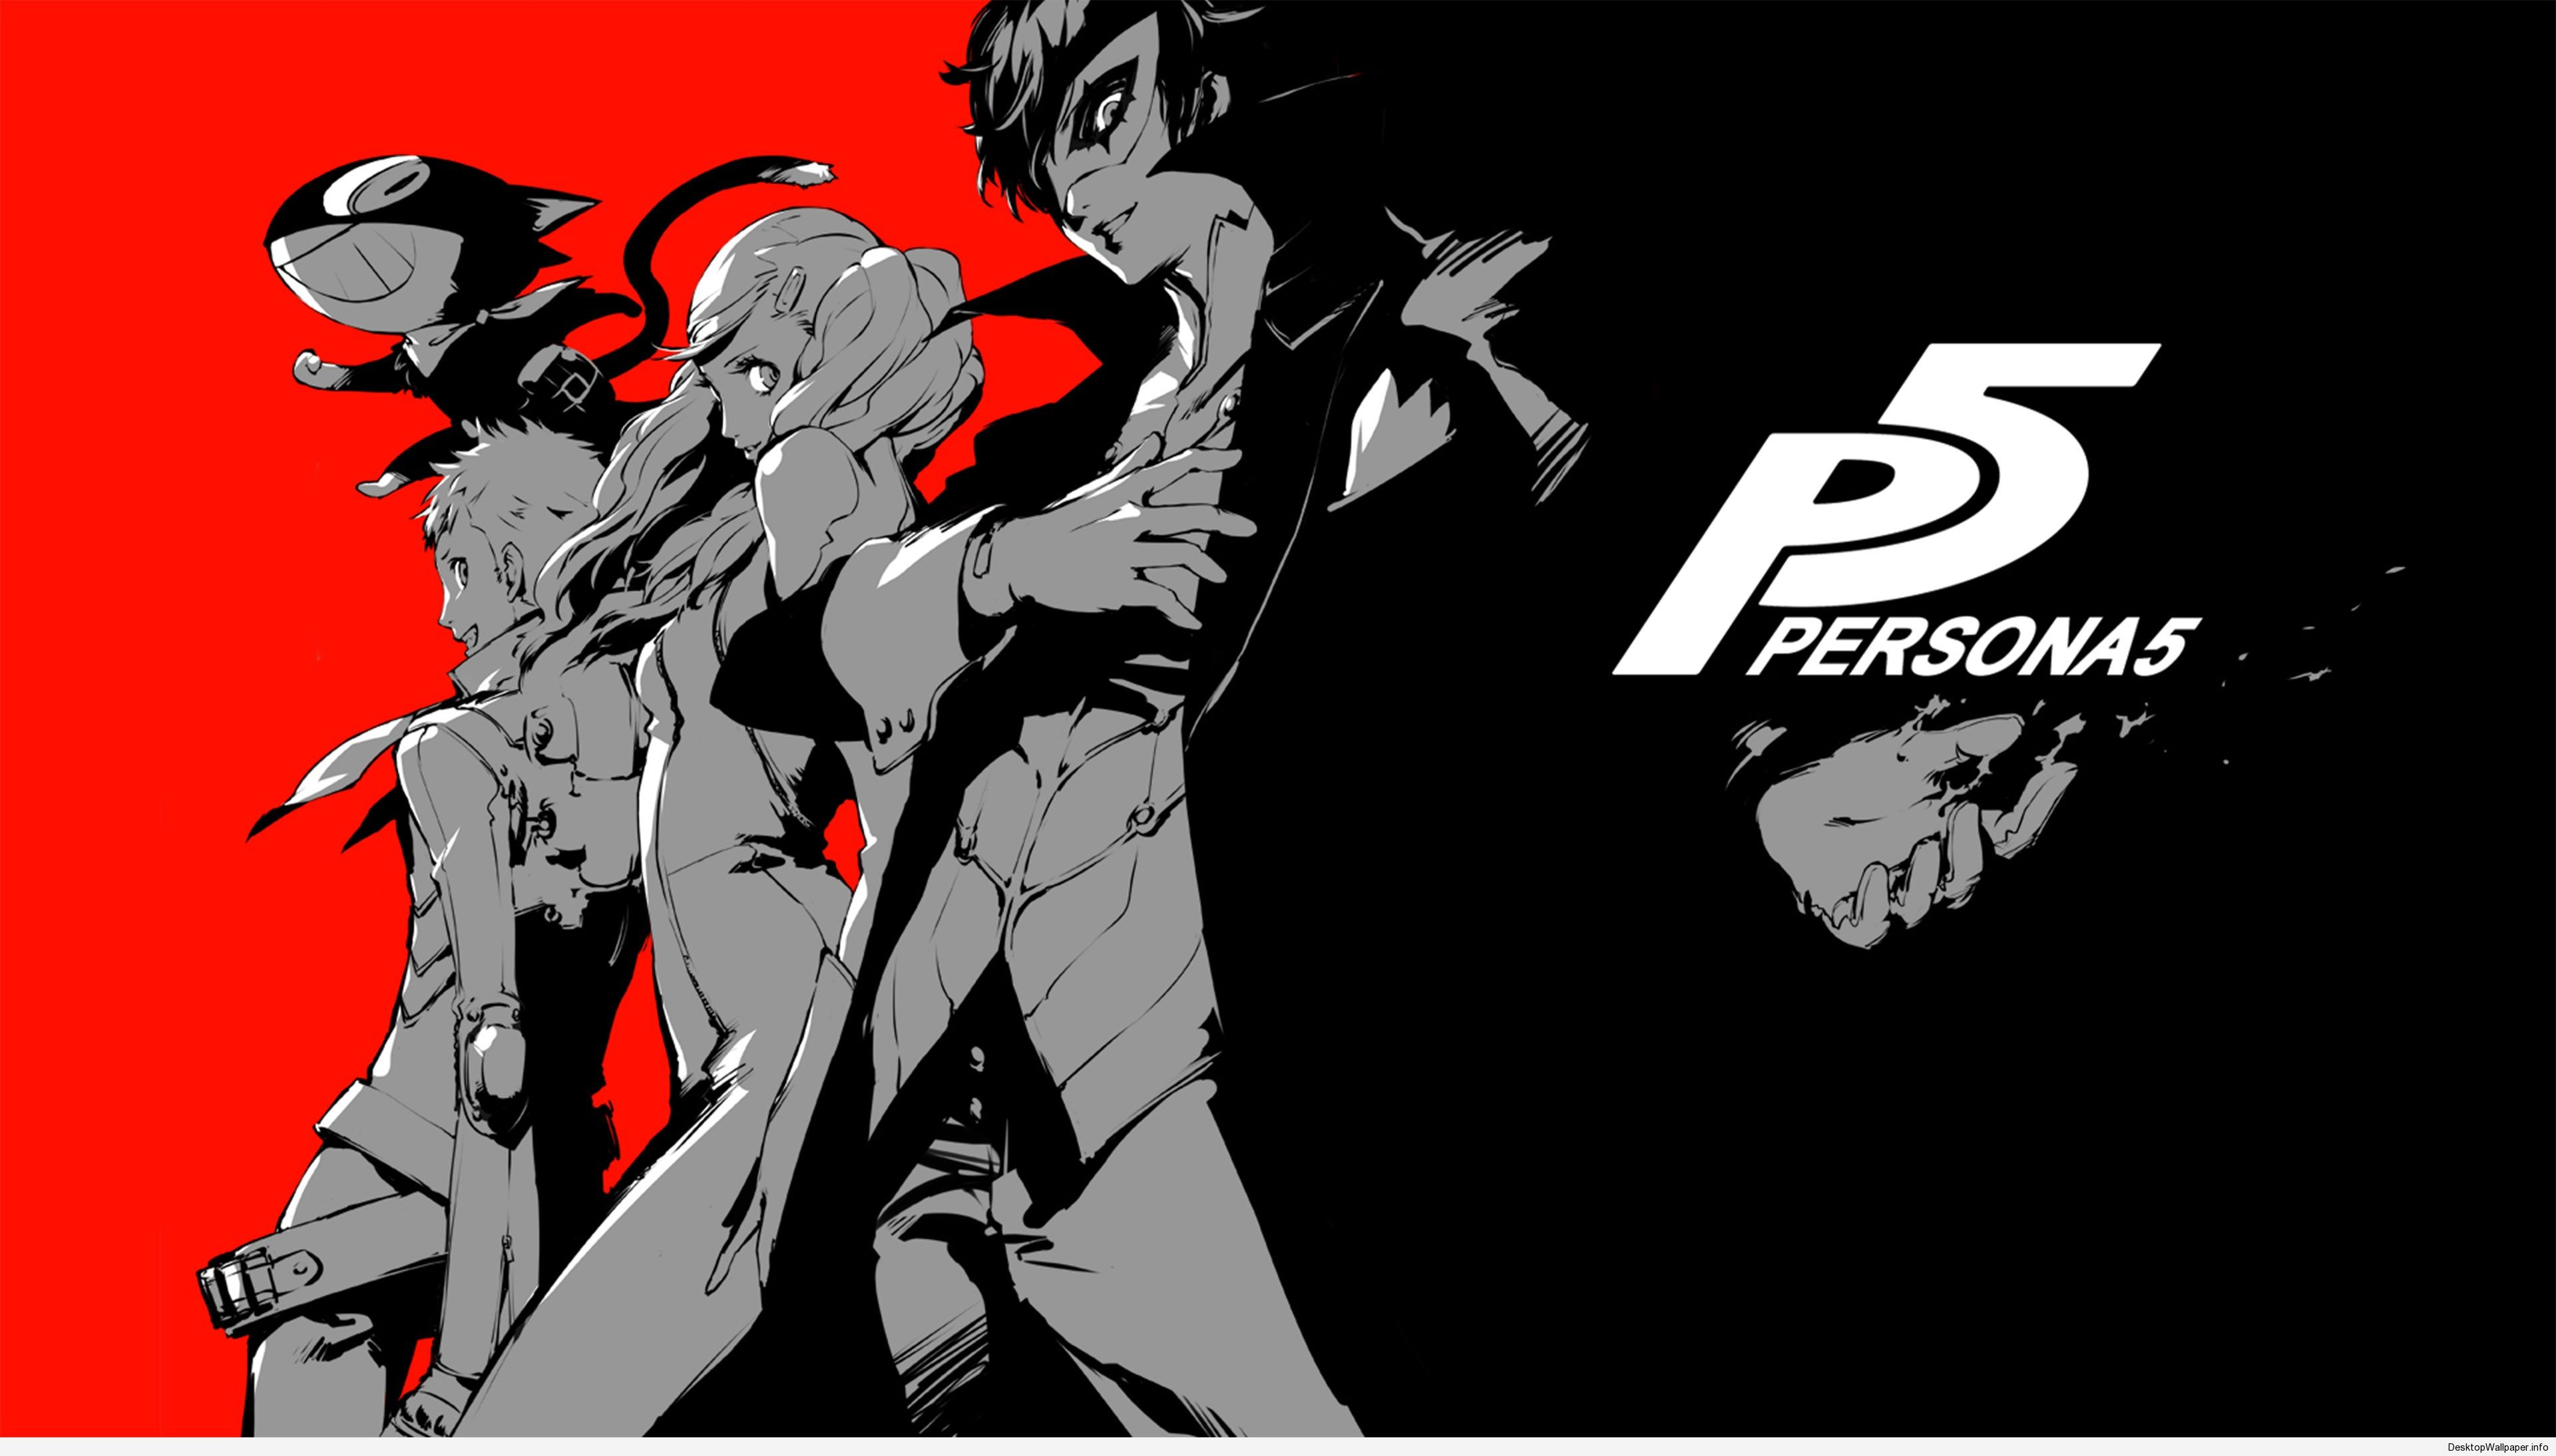 Persona 5 Wallpaper 4k Http Desktopwallpaper Info Persona 5 Wallpaper 4k 6010 Persona Wallpaper Persona Wallpaper Persona 5 Persona 5 Joker Persona